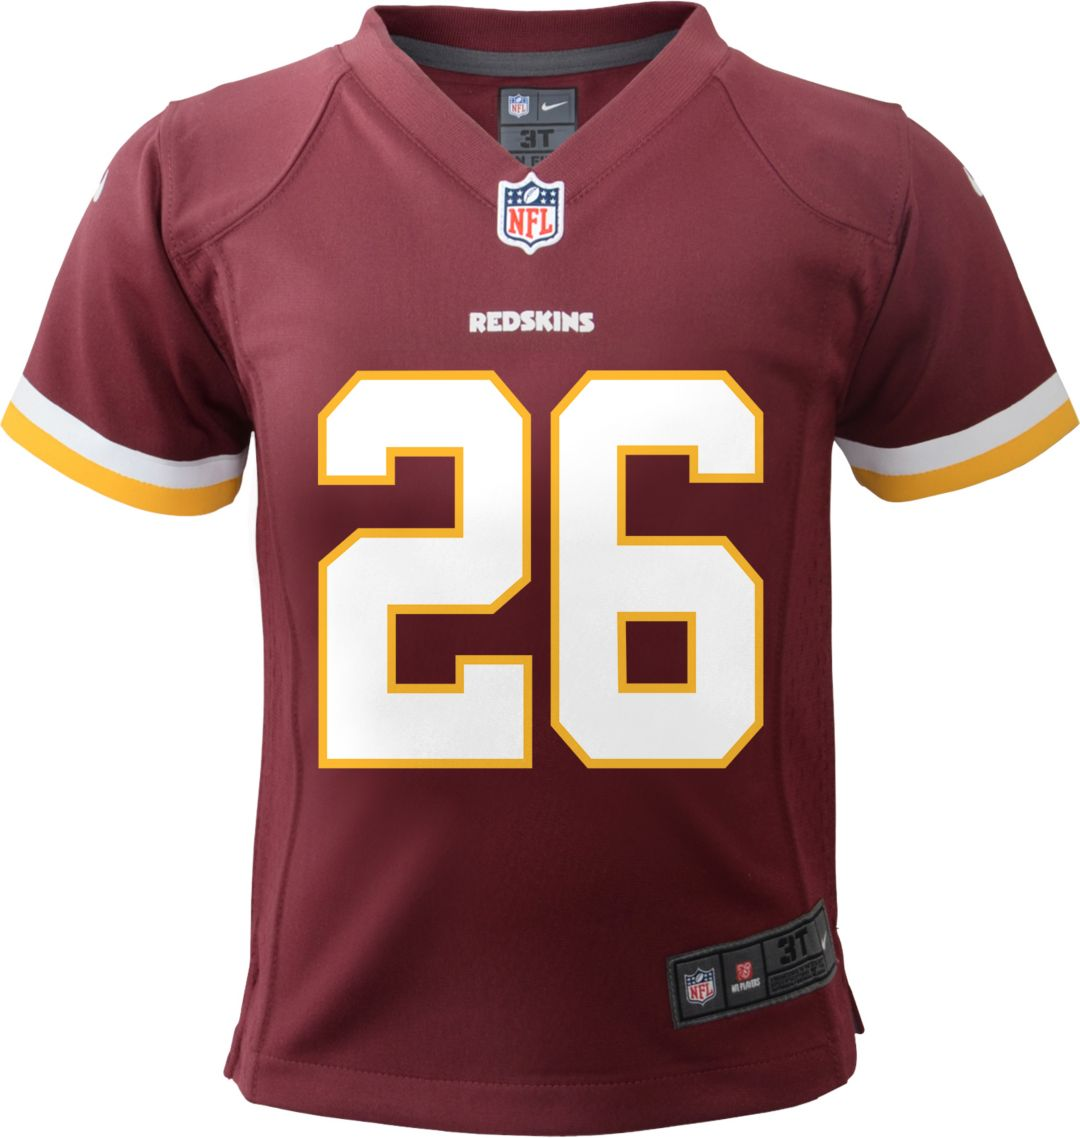 online retailer 7e93c aad56 Nike Toddler Home Game Jersey Washington Redskins Adrian Peterson #26